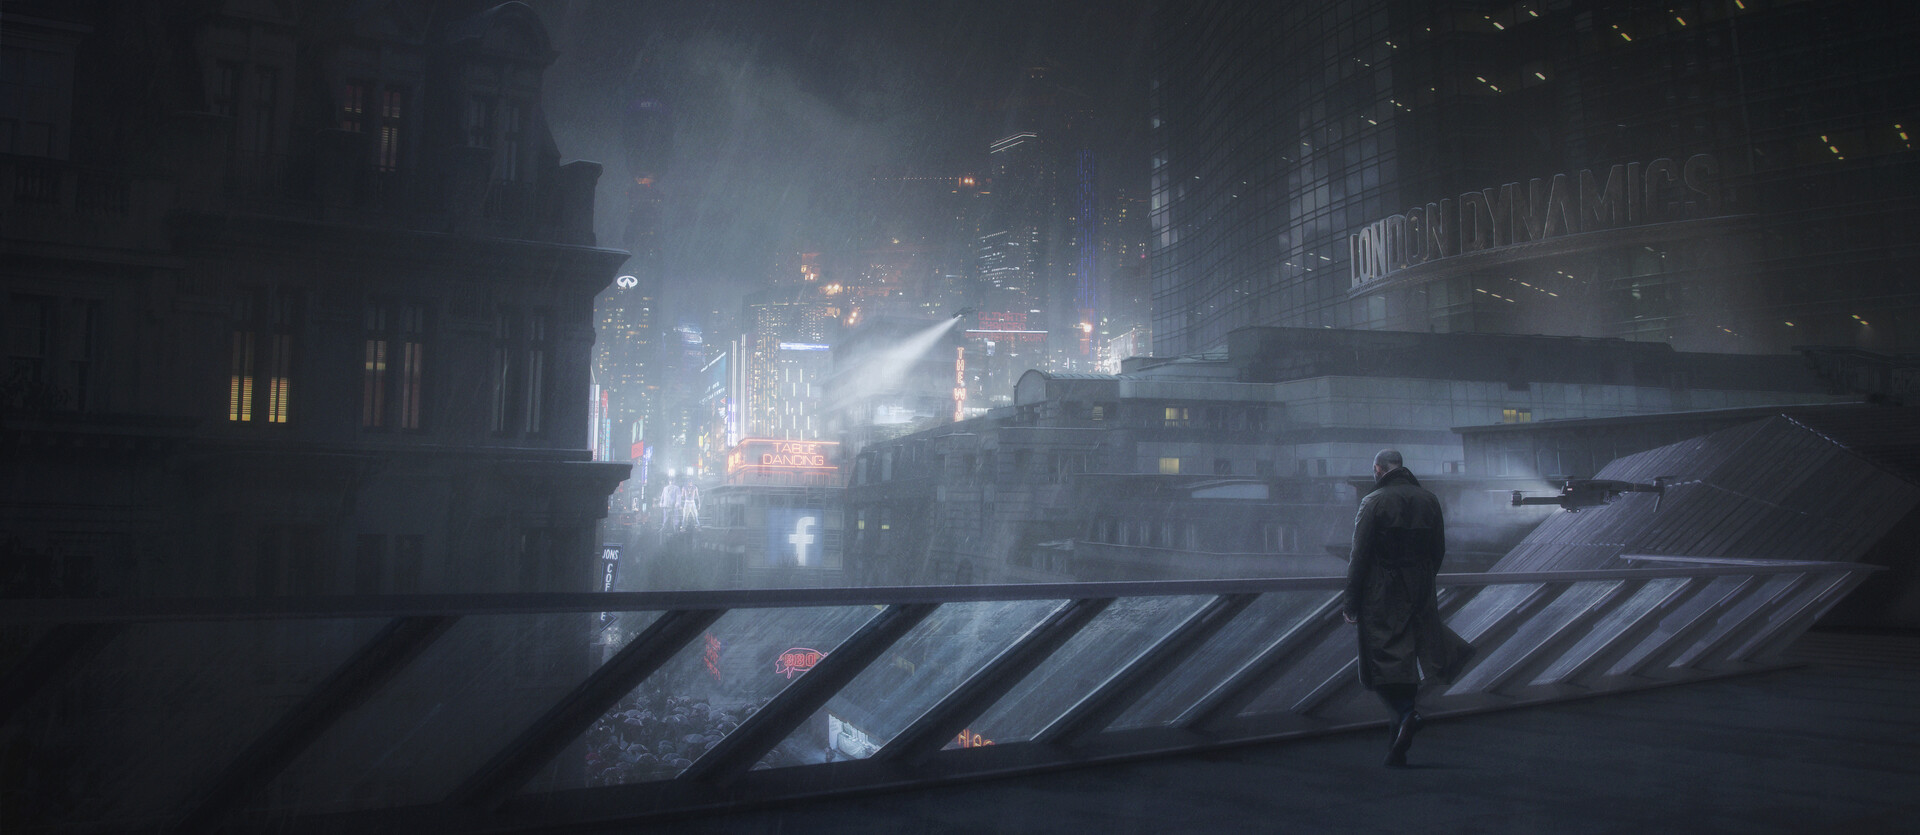 Jack stevens scifi london 2050